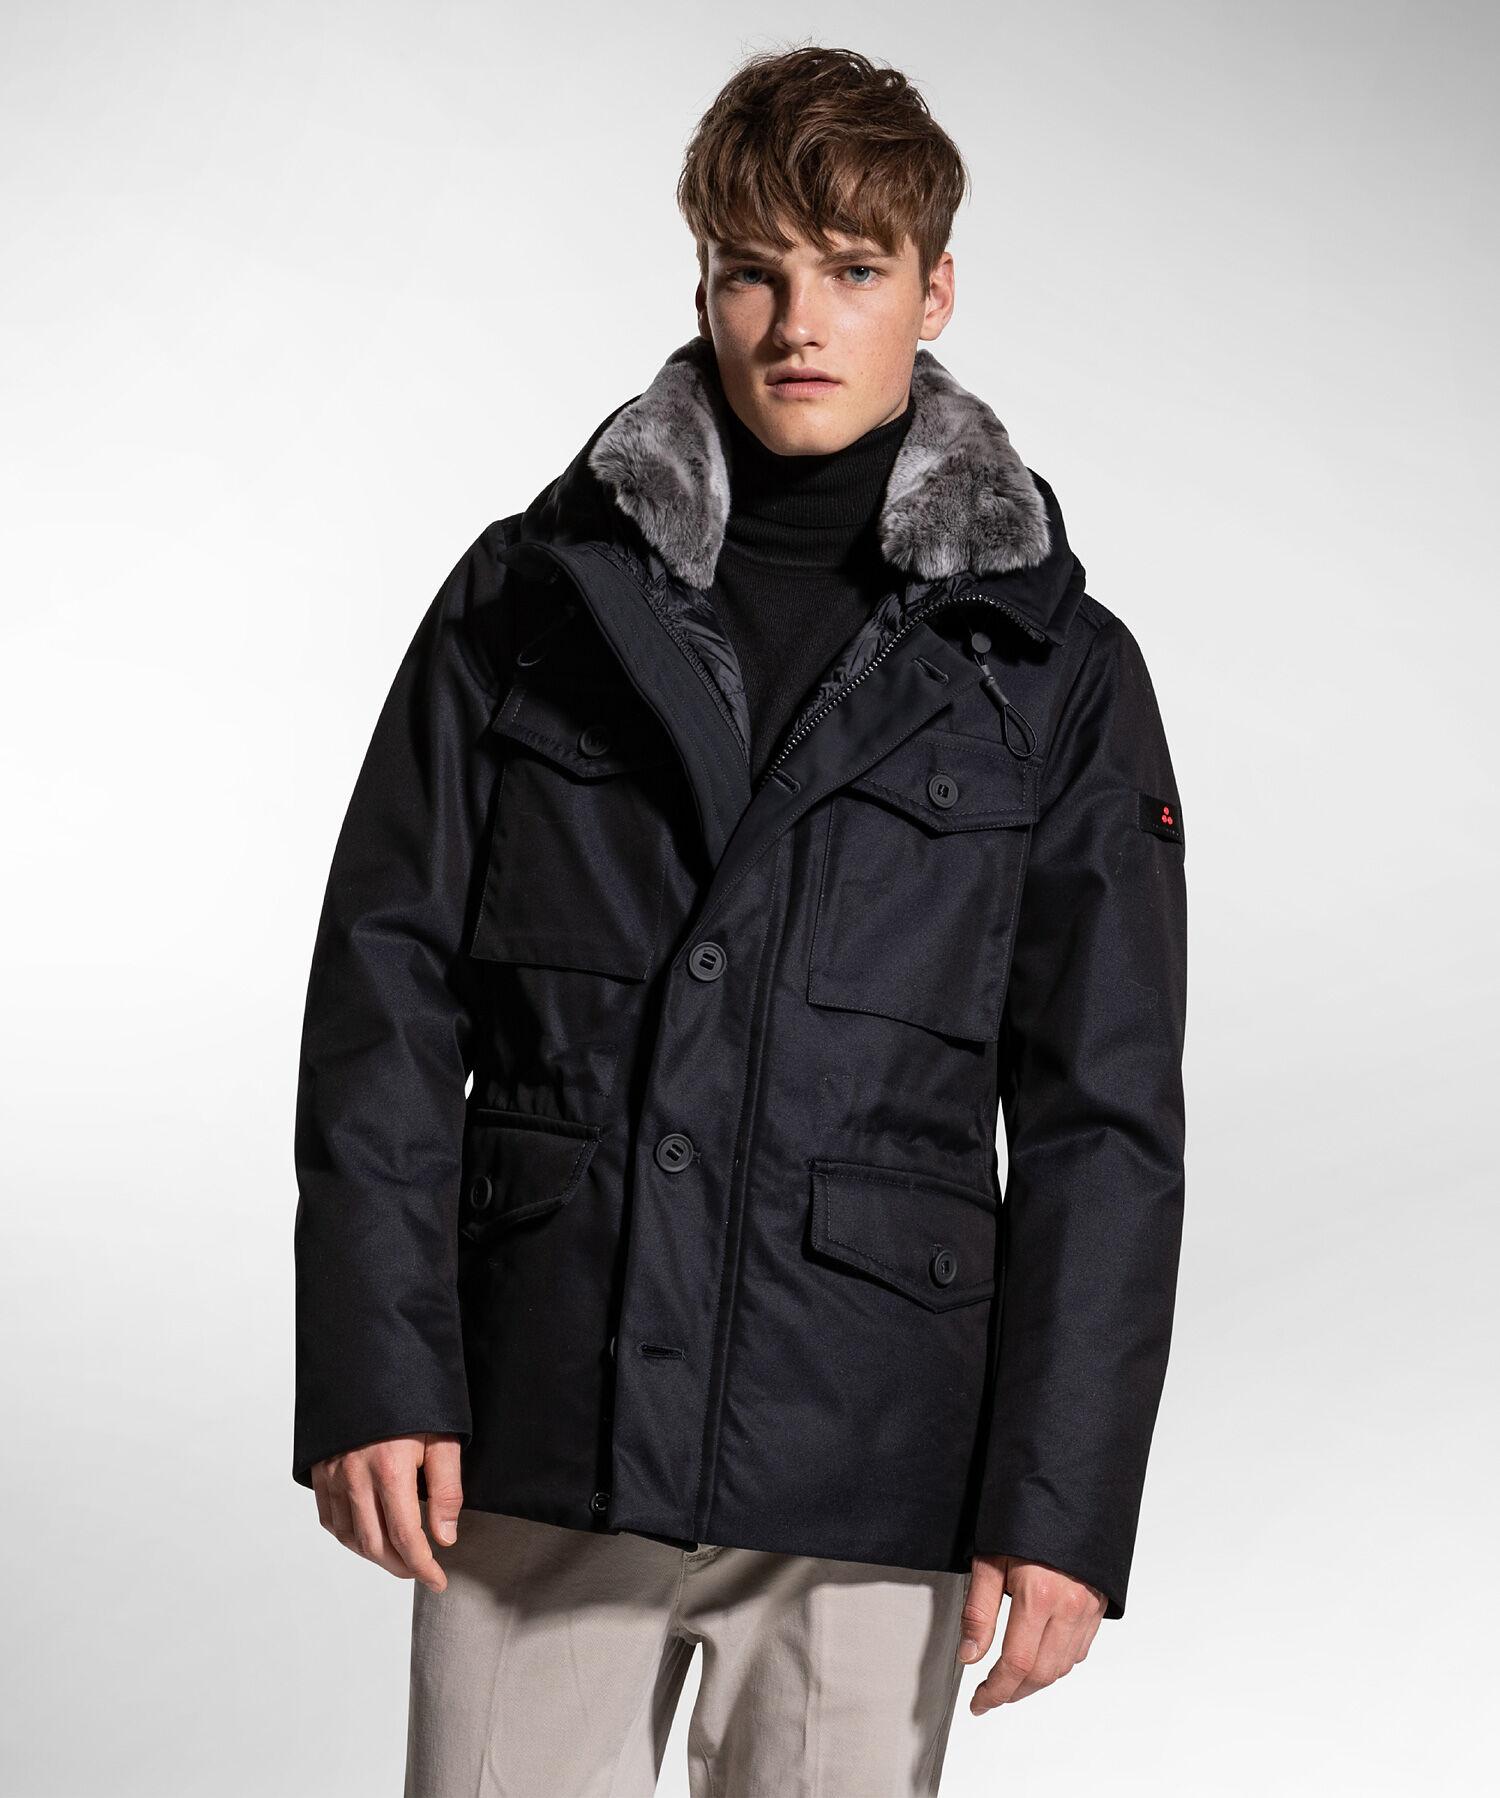 Field Jacket In Tessuto Tecnico - Peuterey